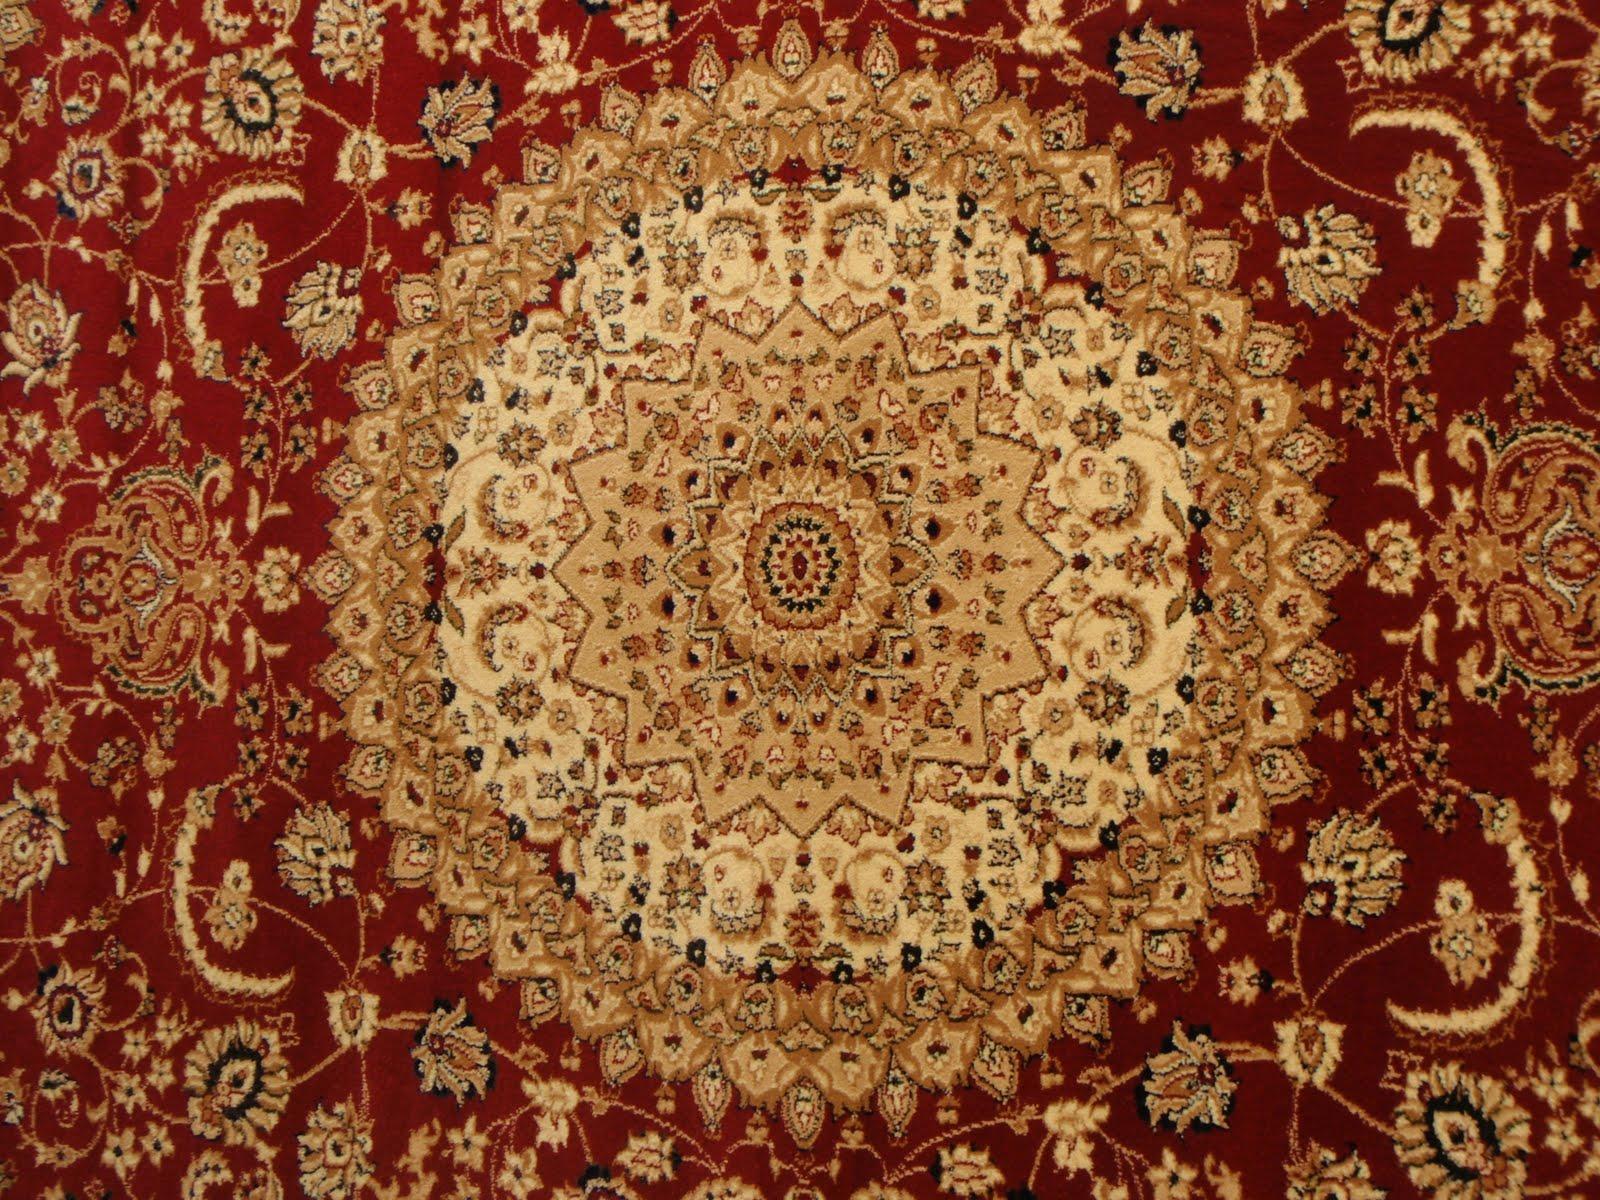 Ramblings of the Cheeseburger Buddha: Carpet Designs